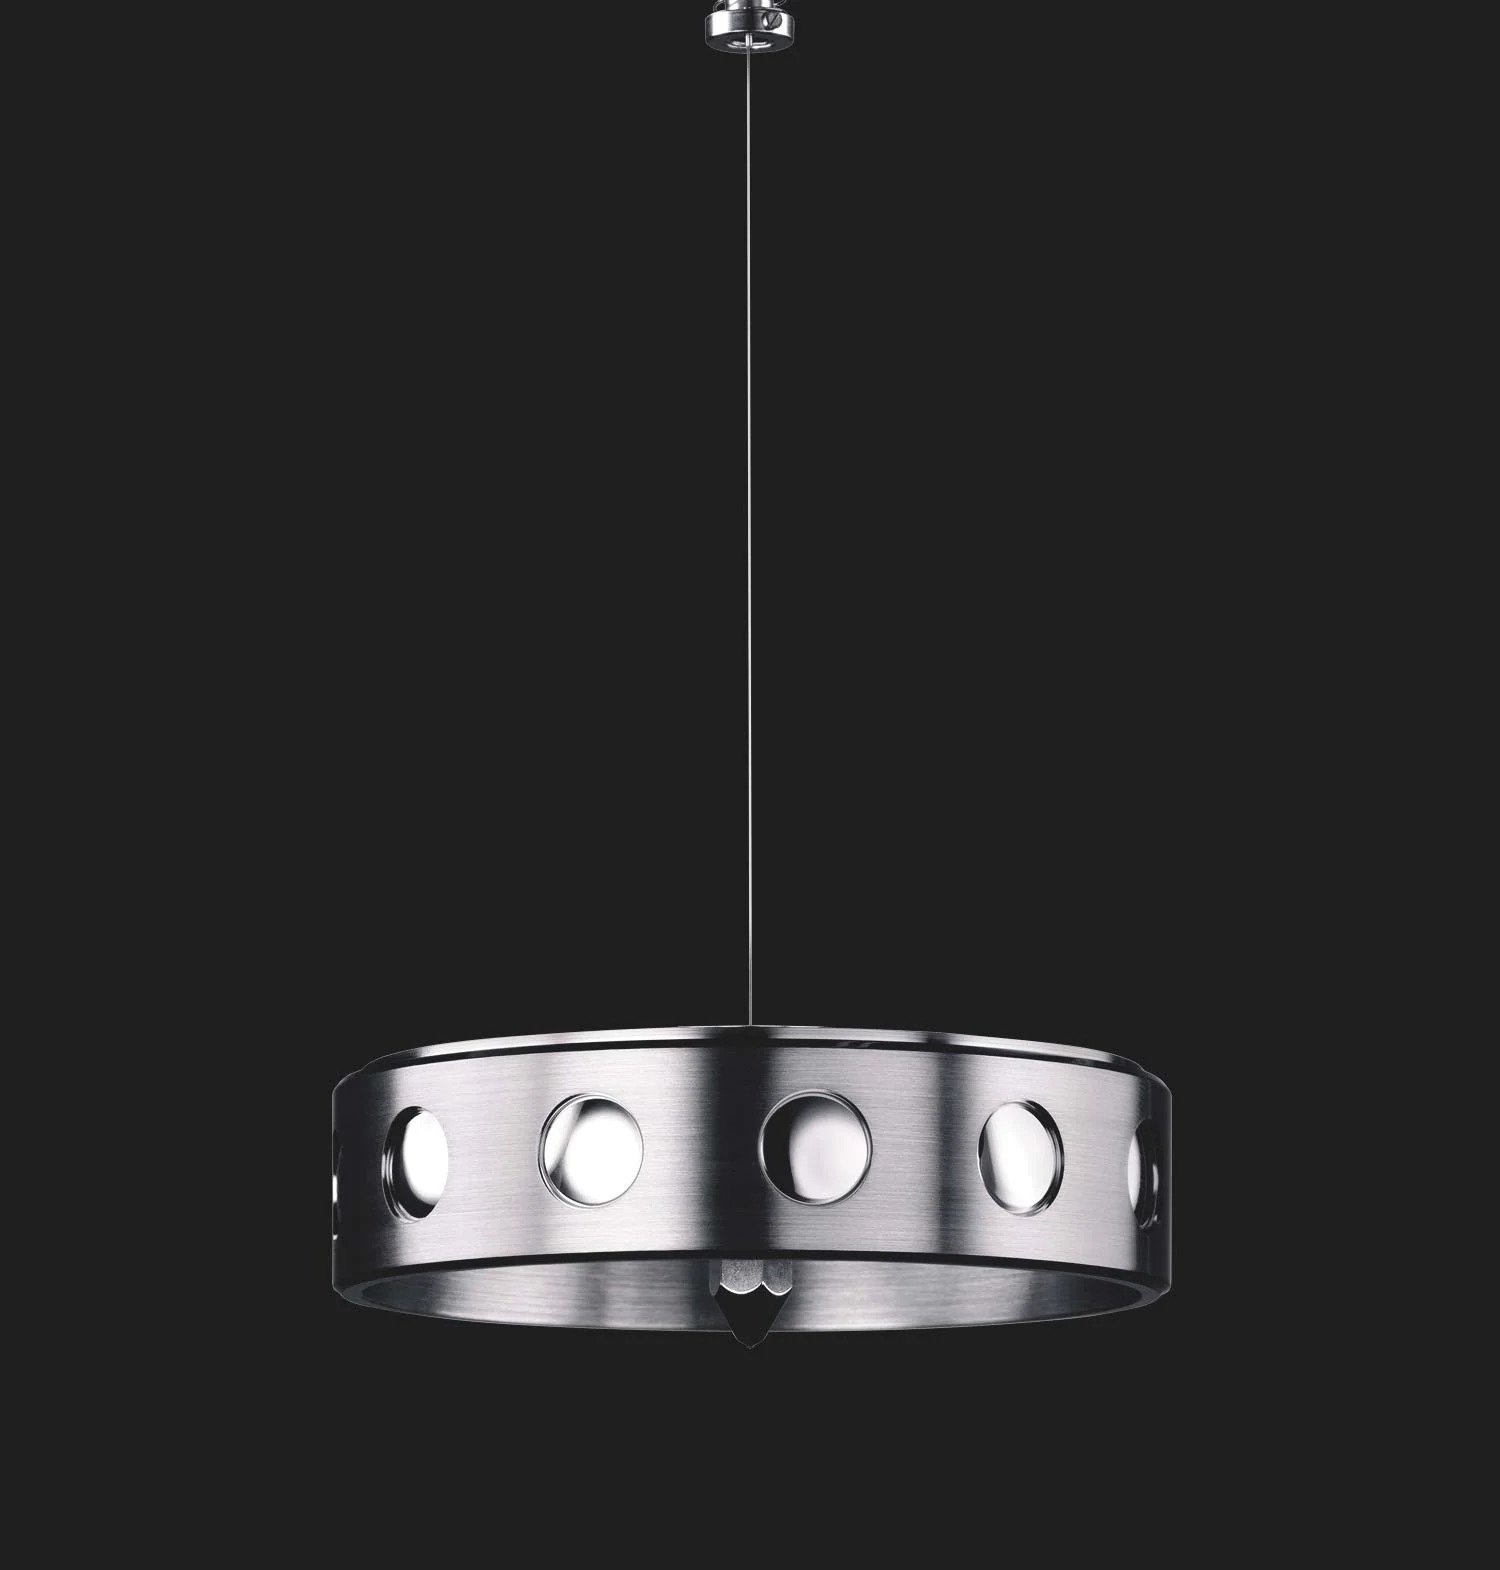 Péndulo del Jaeger-LeCoultre Atmos